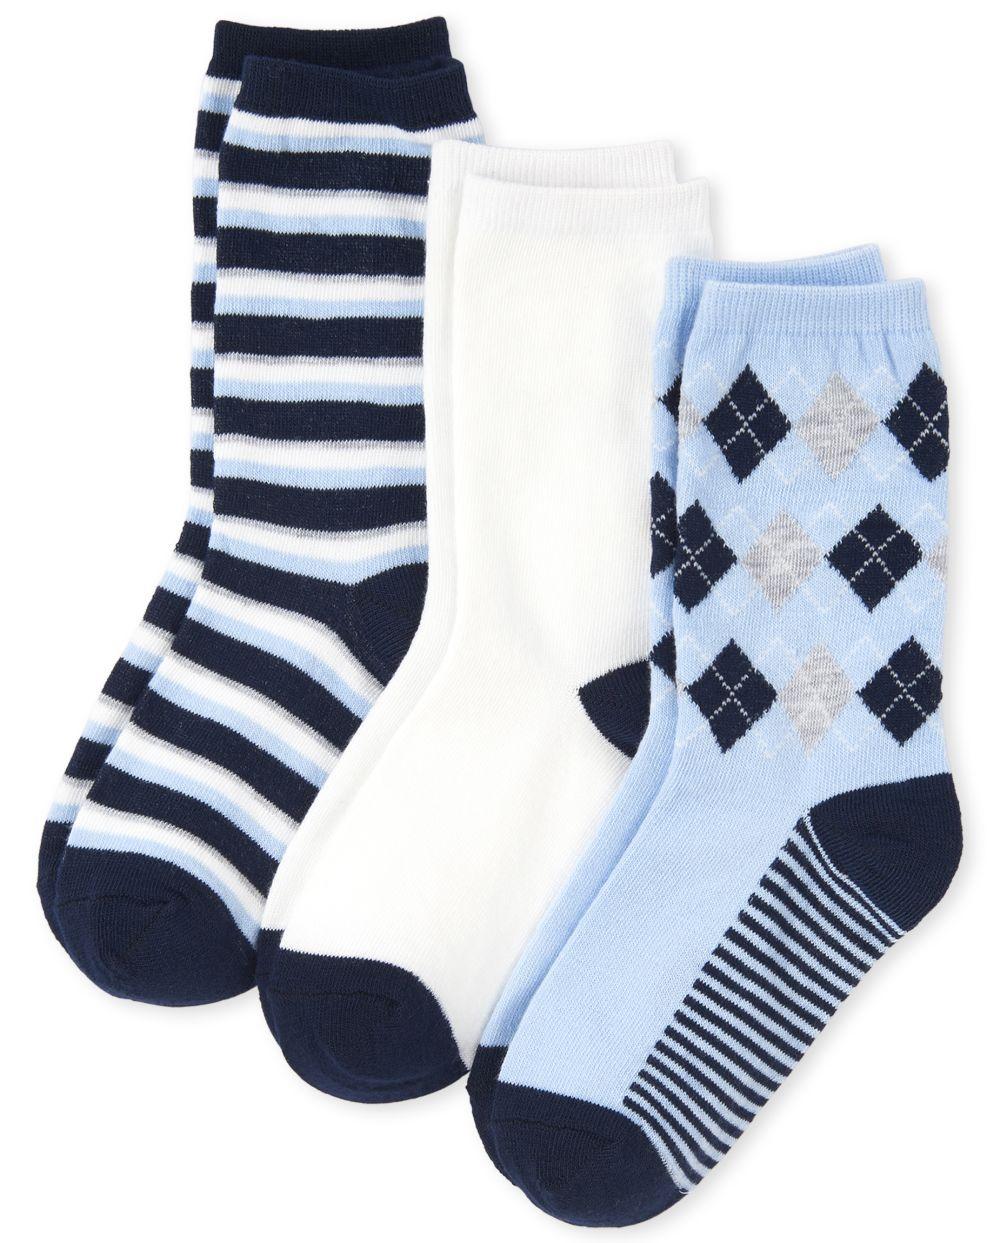 Boys Uniform Argyle Crew Socks 3-Pack